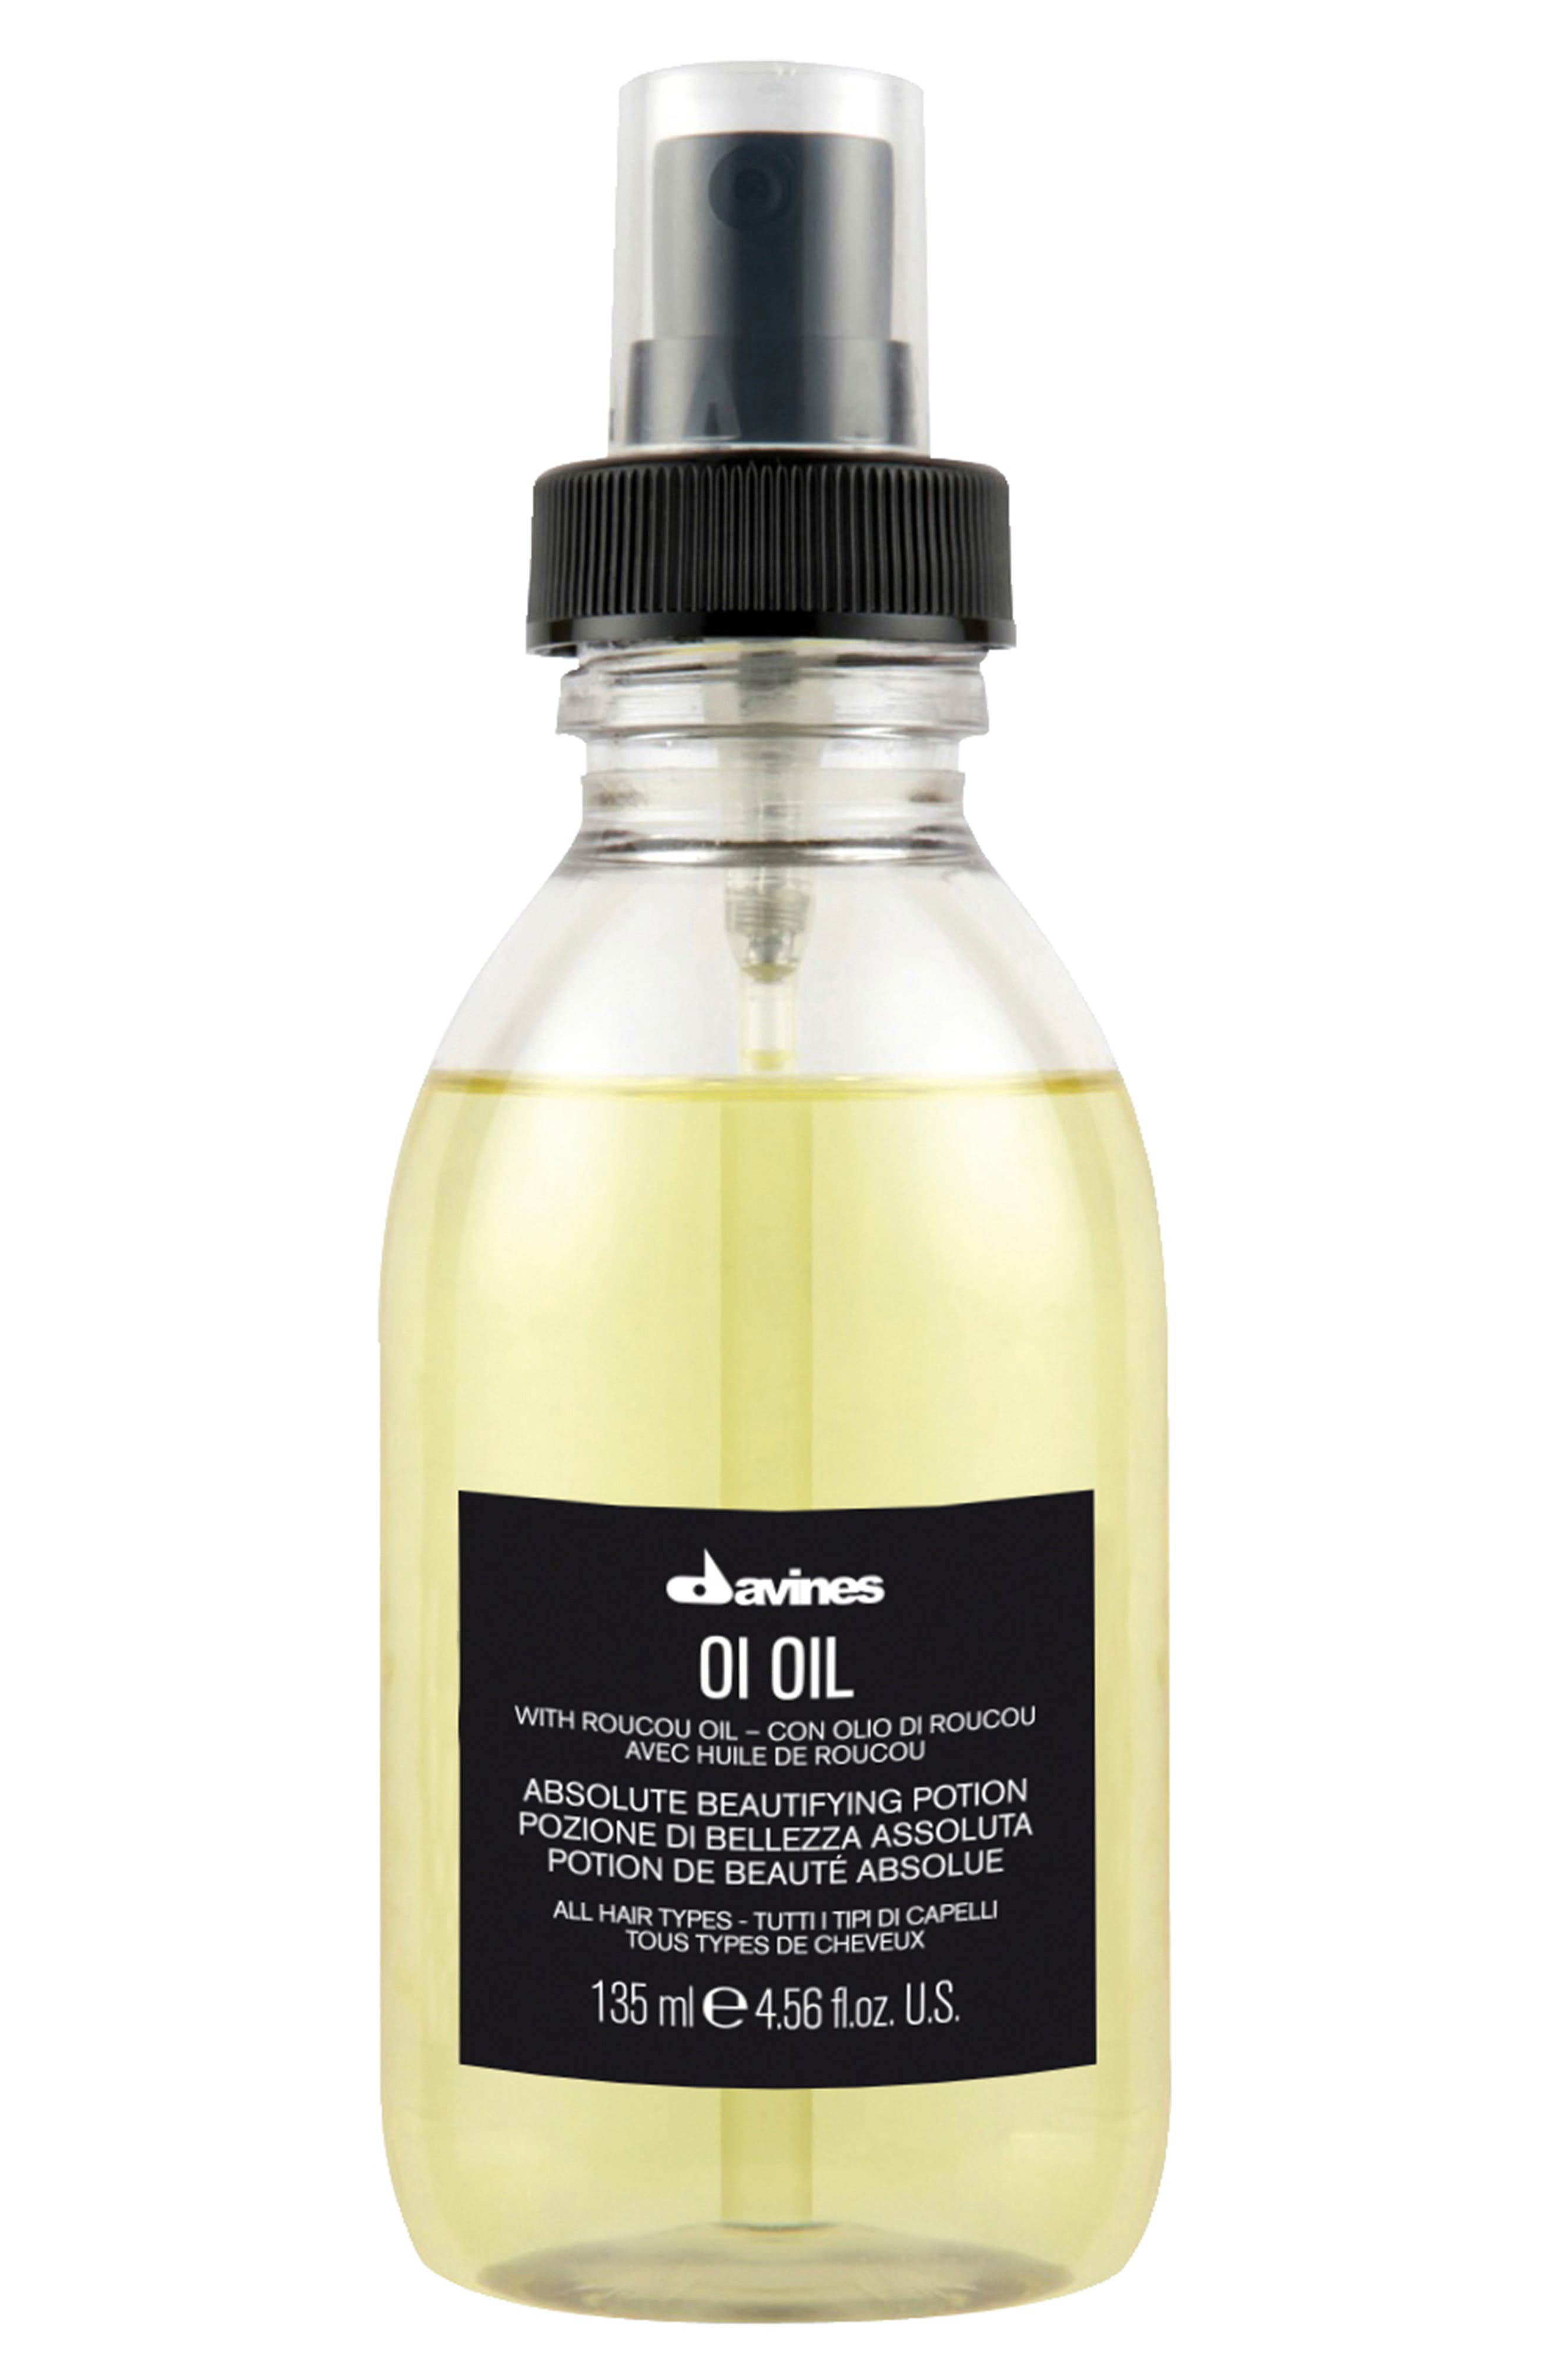 Davines OI Oil at Nordstrom